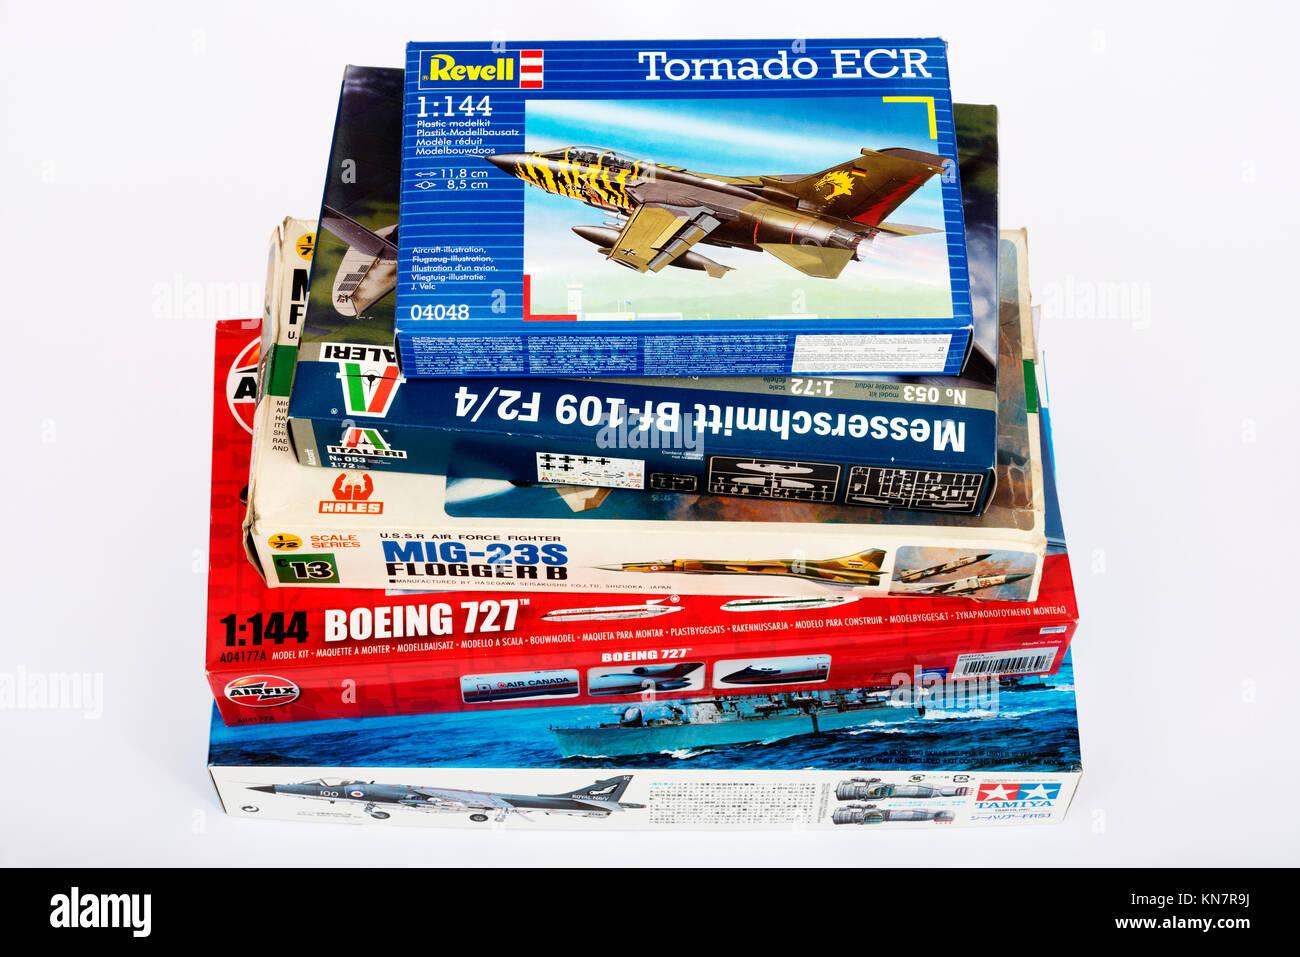 Model Kits Stock Photos & Model Kits Stock Images - Alamy